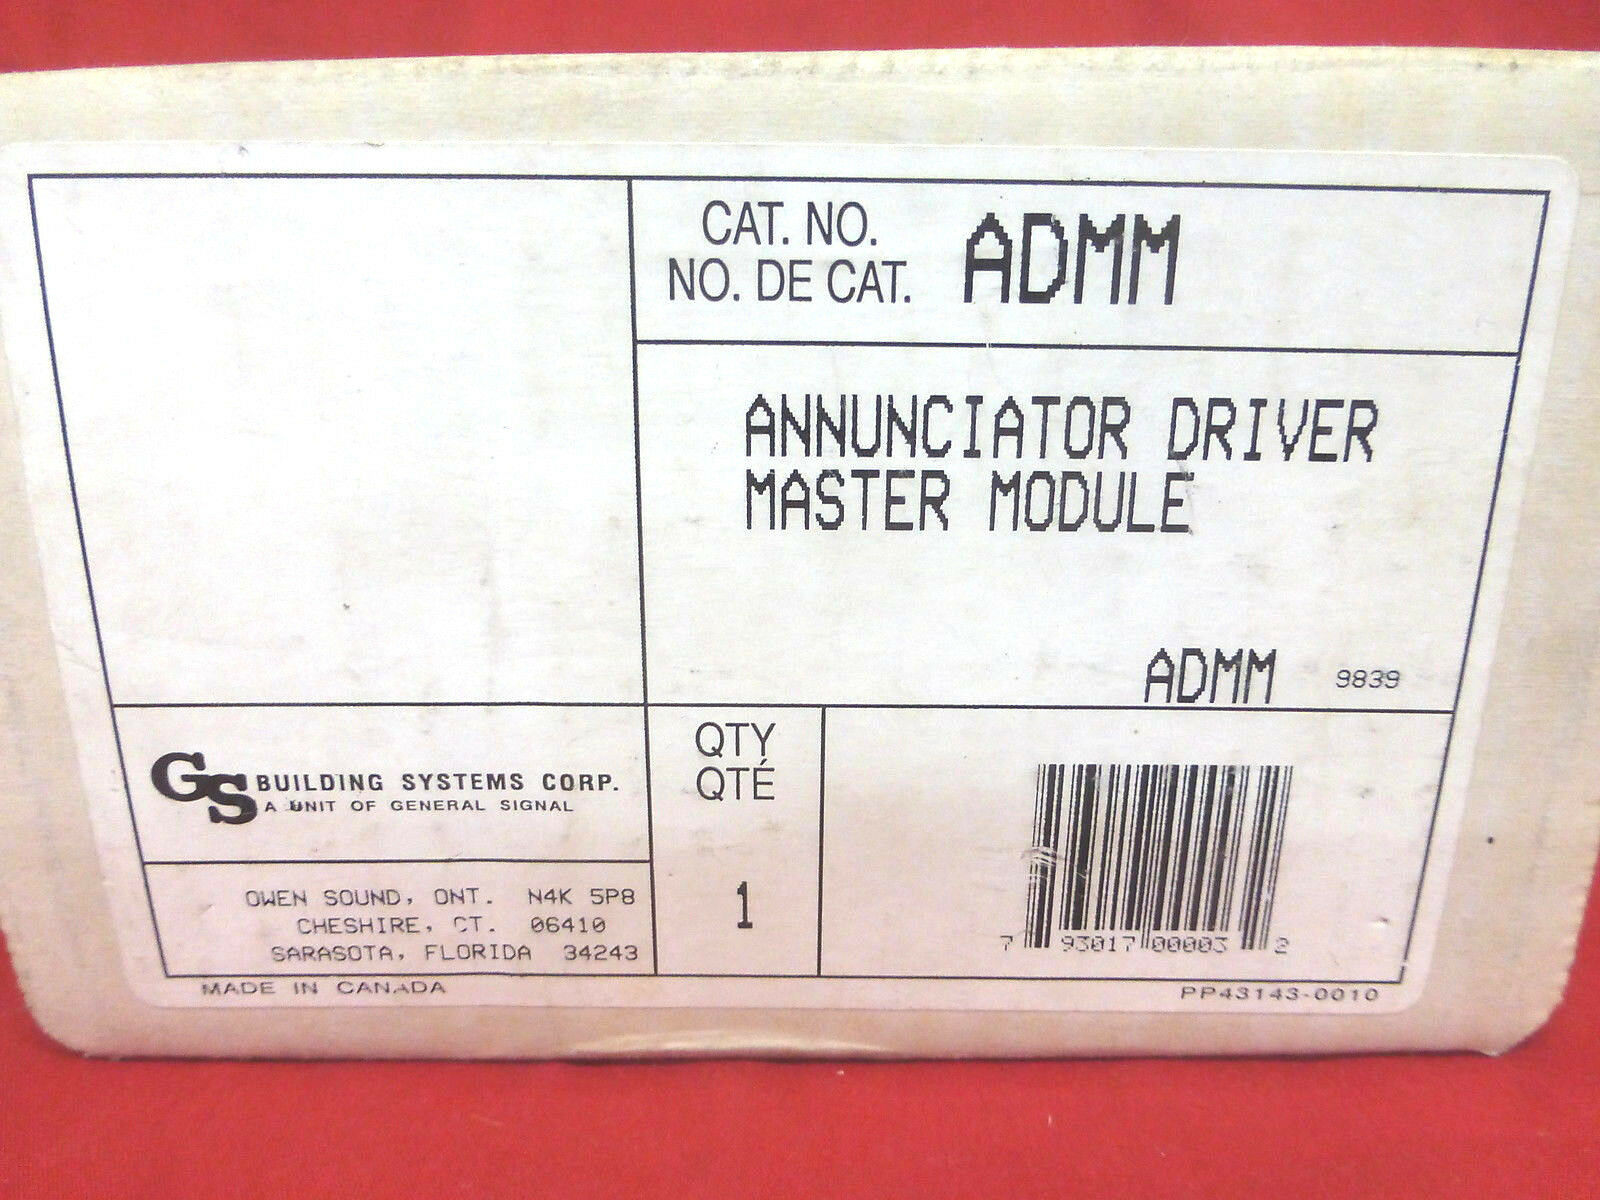 GENERAL SIGNAL ADMM, 130279, 140279 NEW ANNUNCIATOR DRIVER MASTER MODULE (2E2)